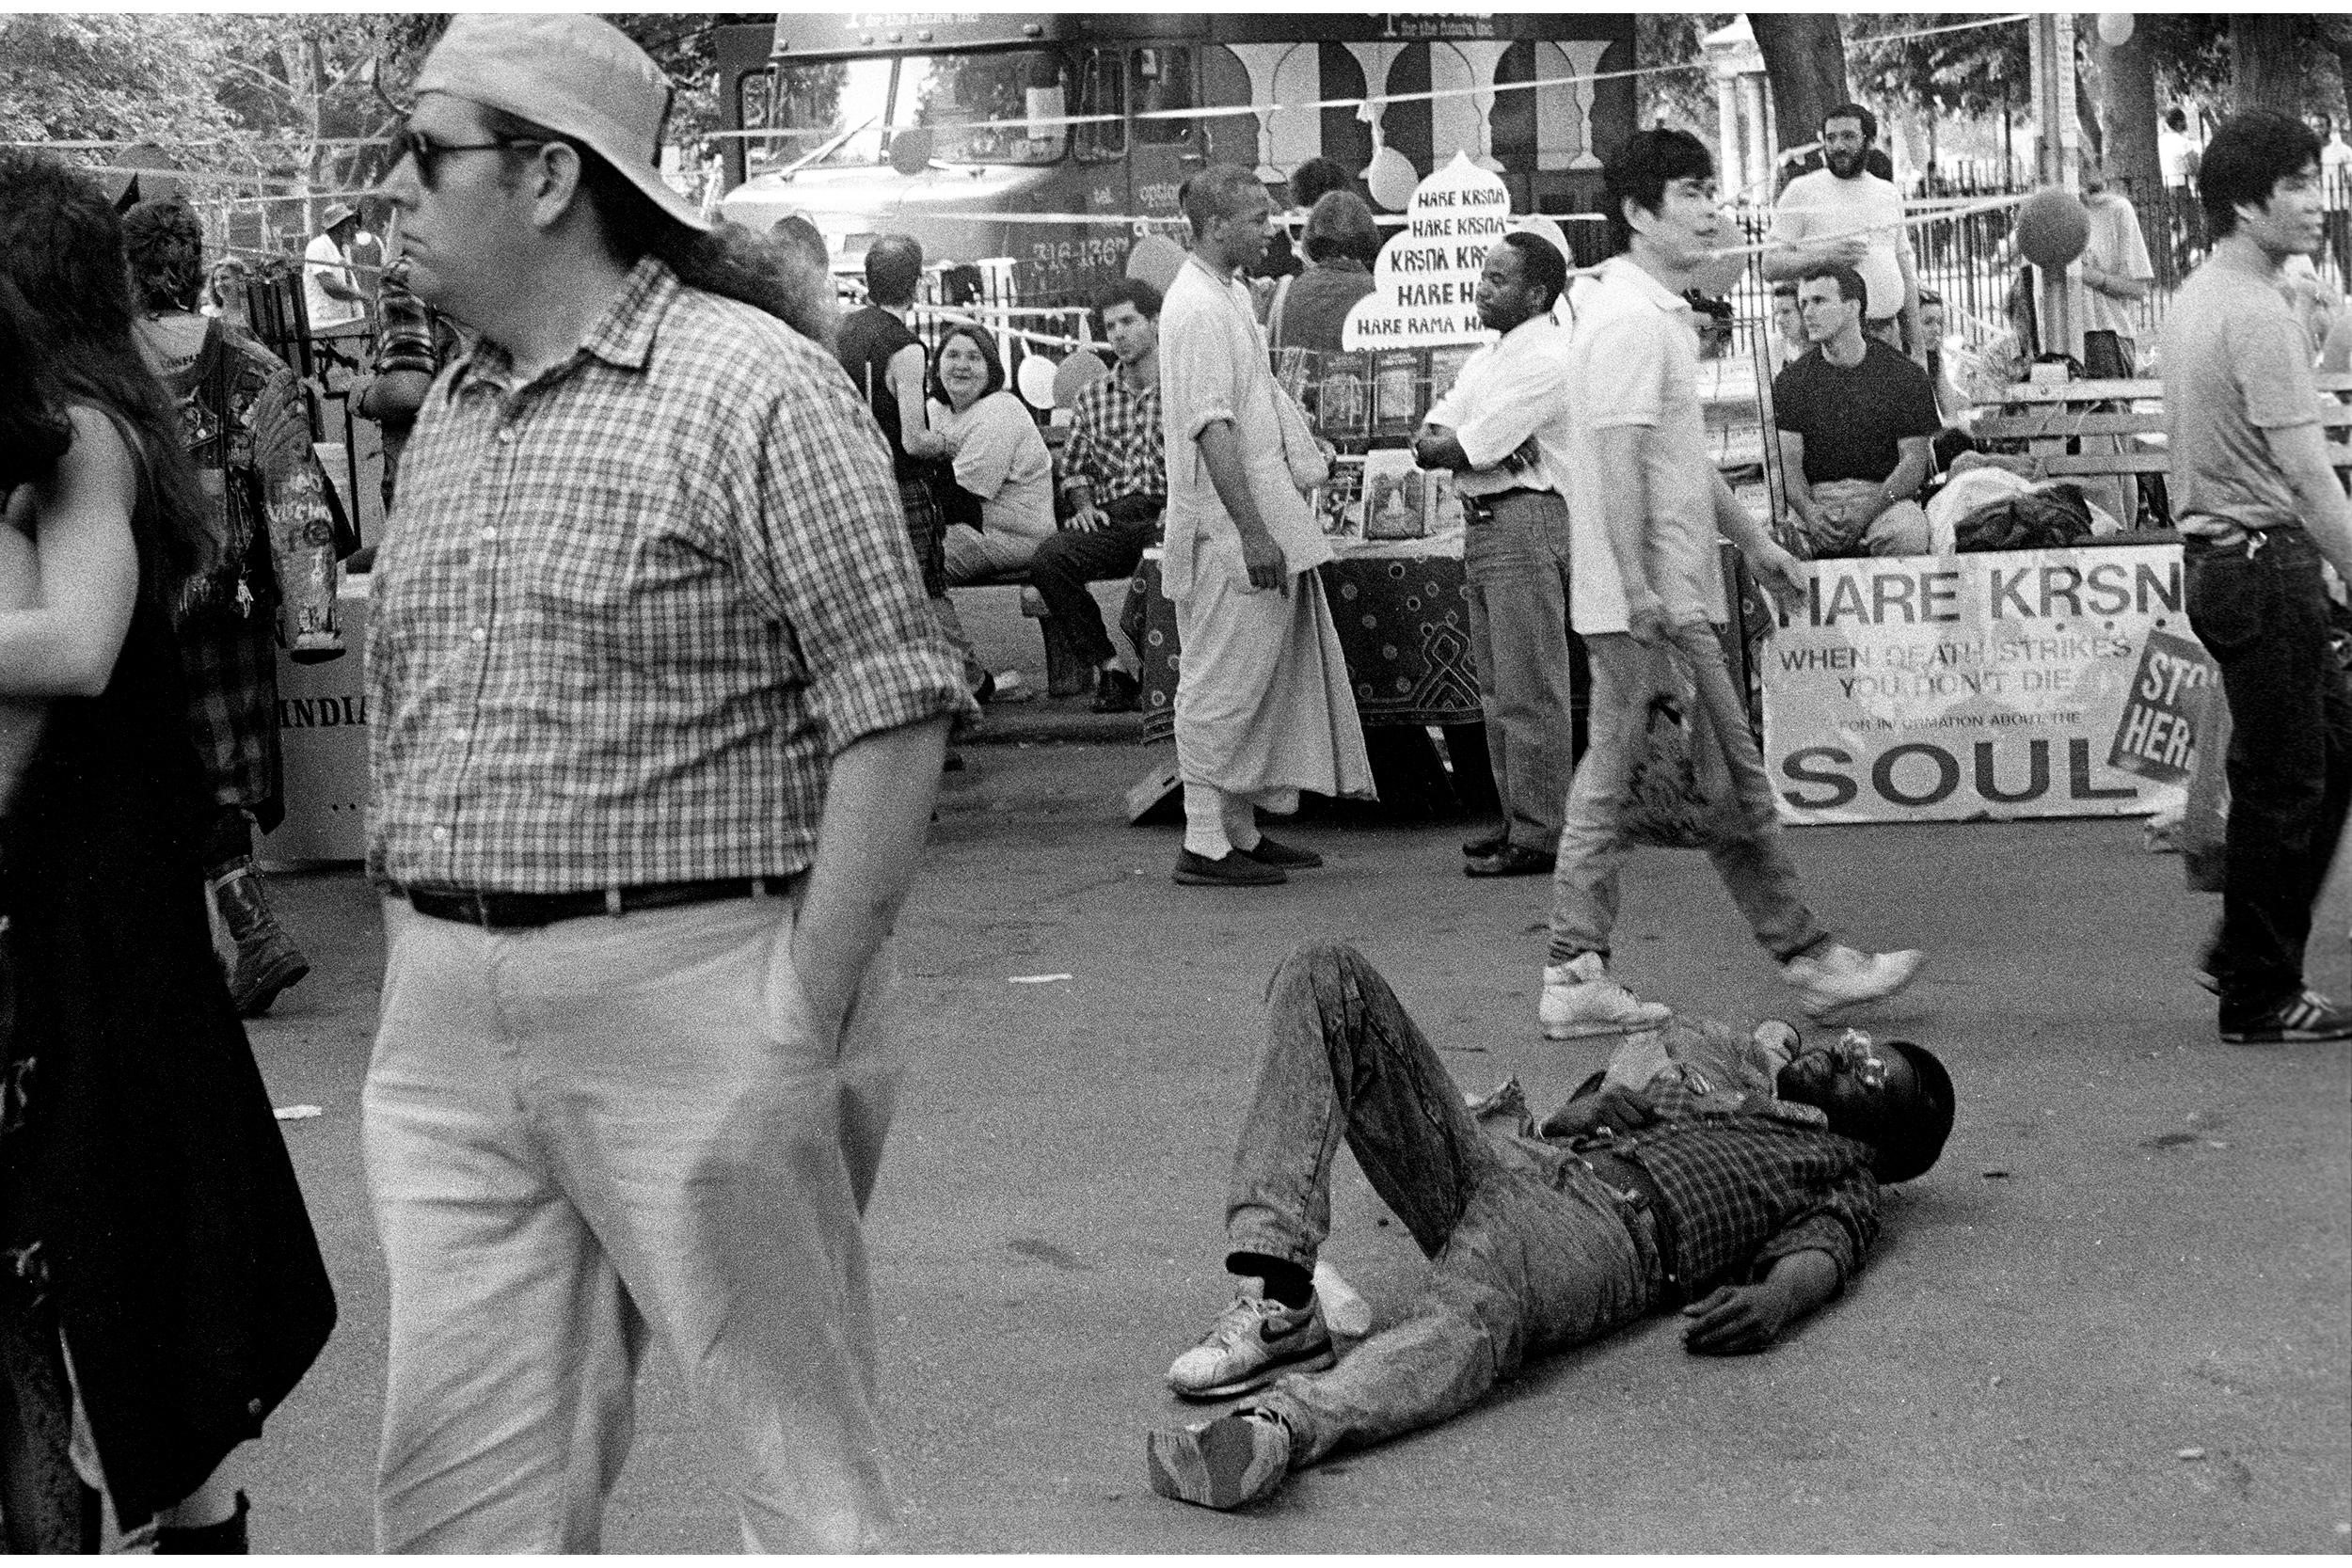 Tompkins Square Park, 1989